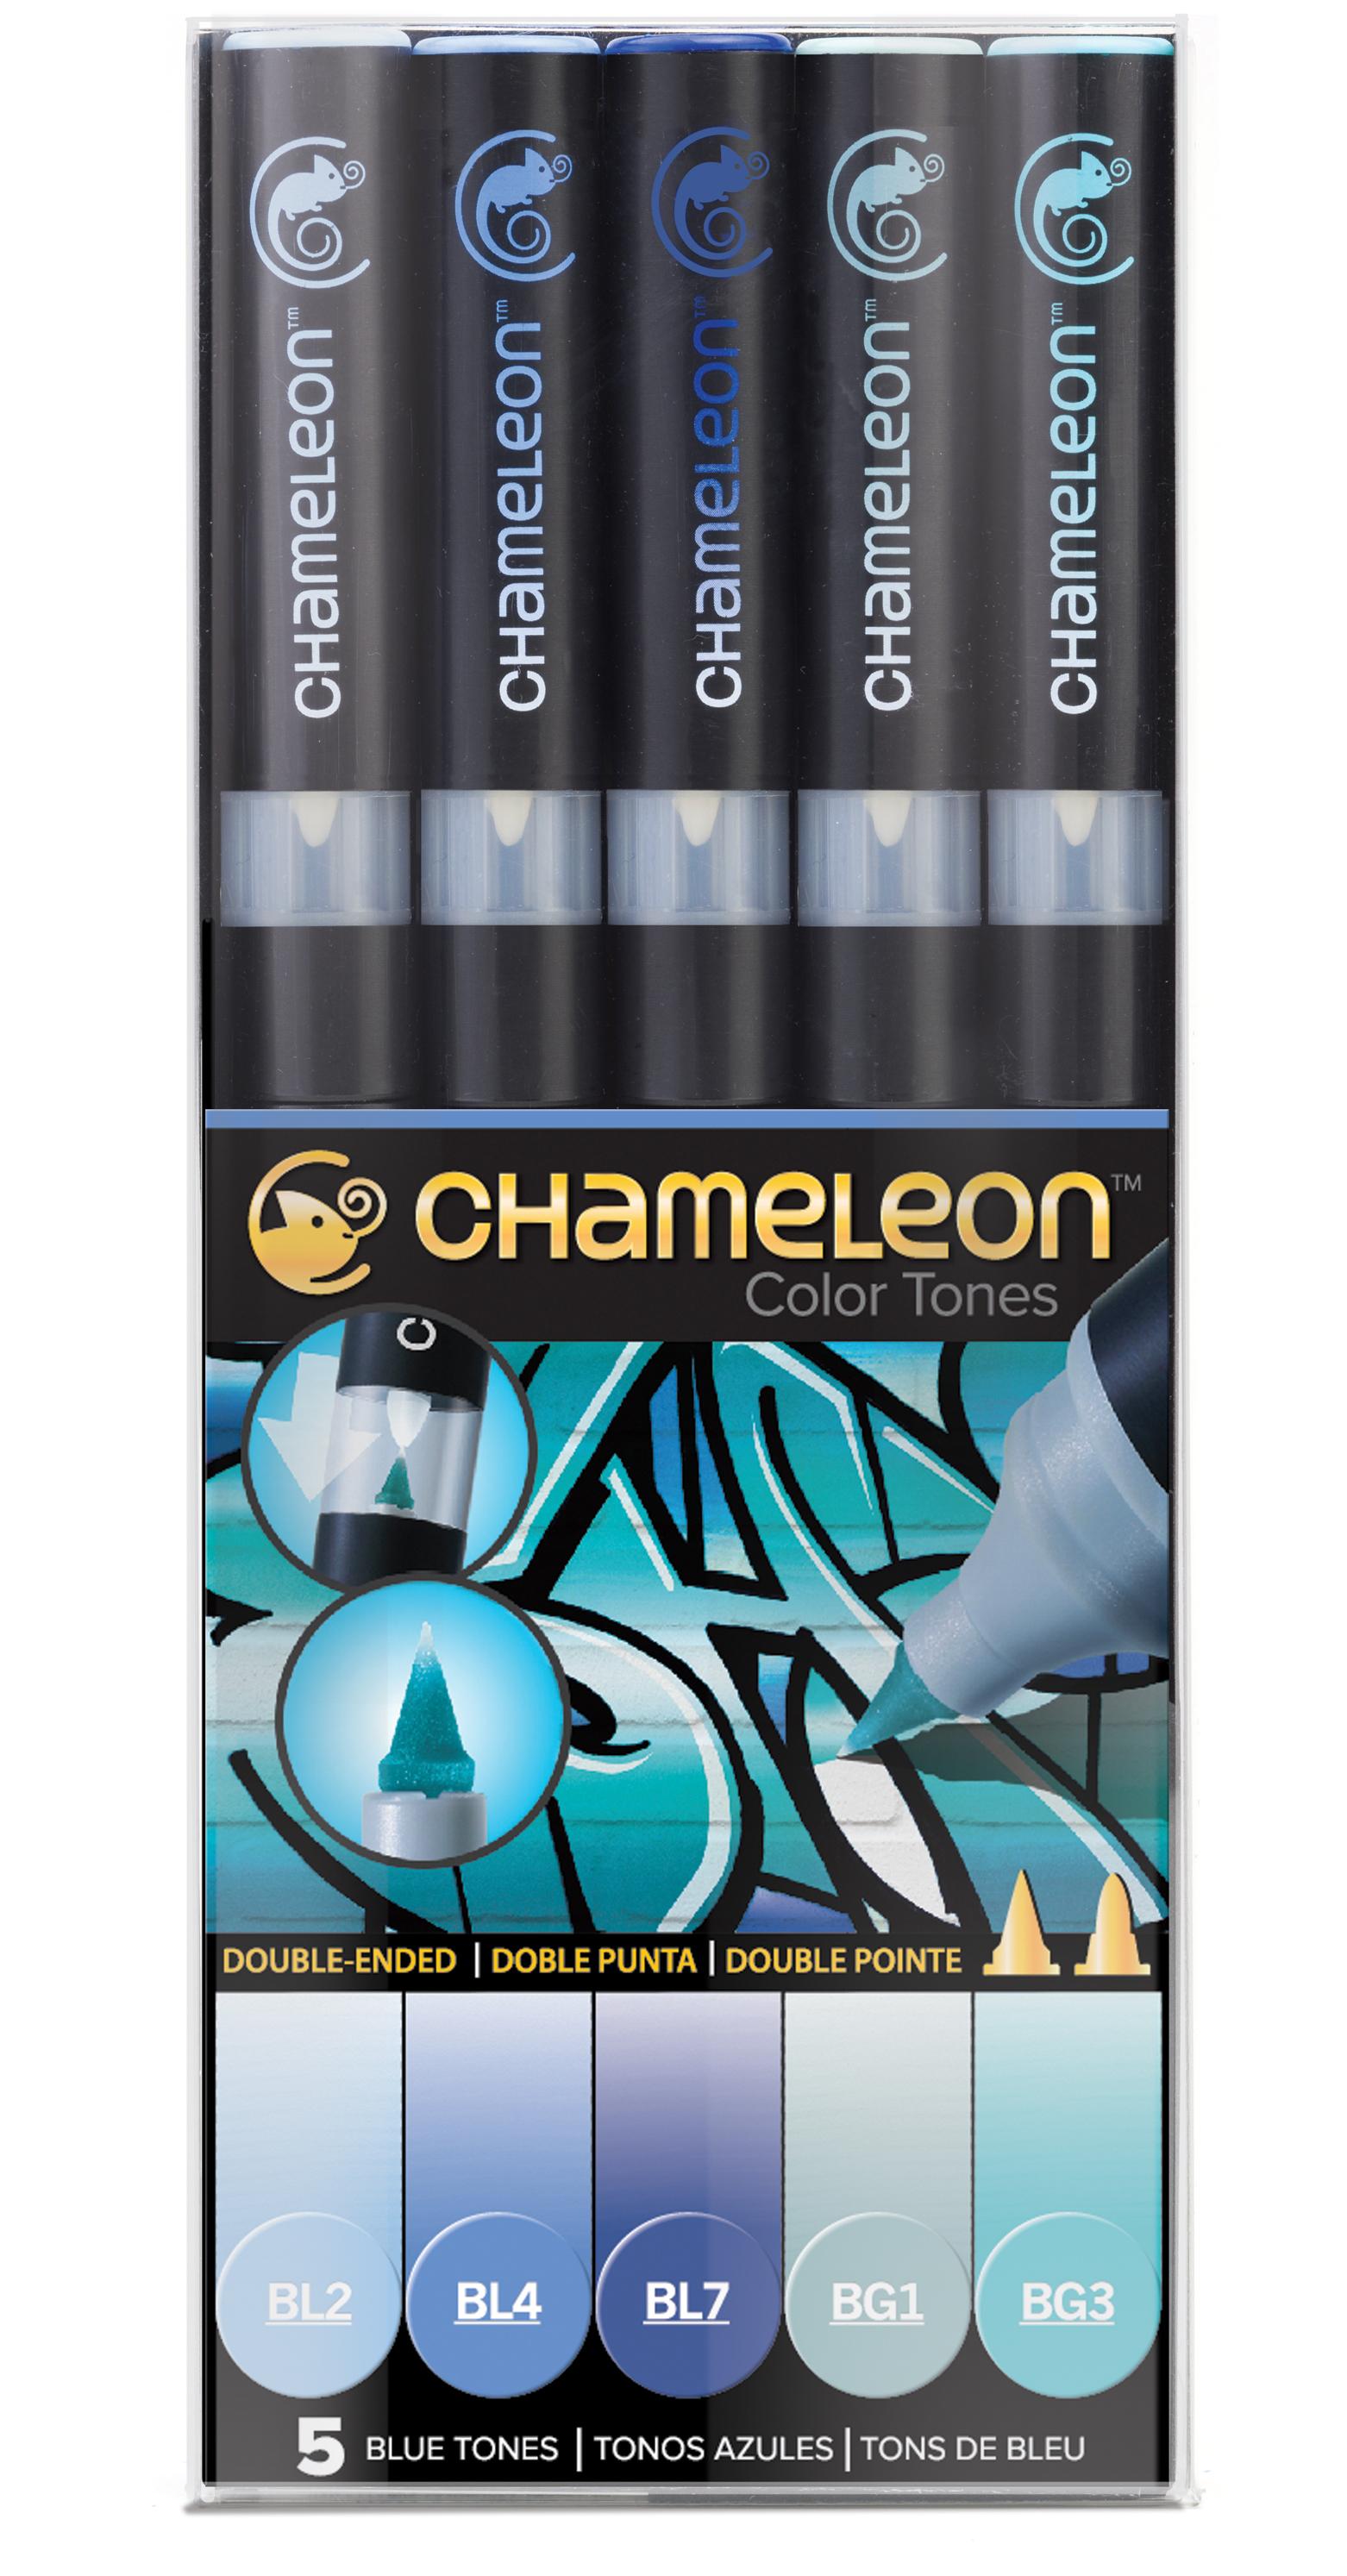 Chameleon Pen 5 Pen Blue Set (カメレオンペン 5本入りブルーセット)